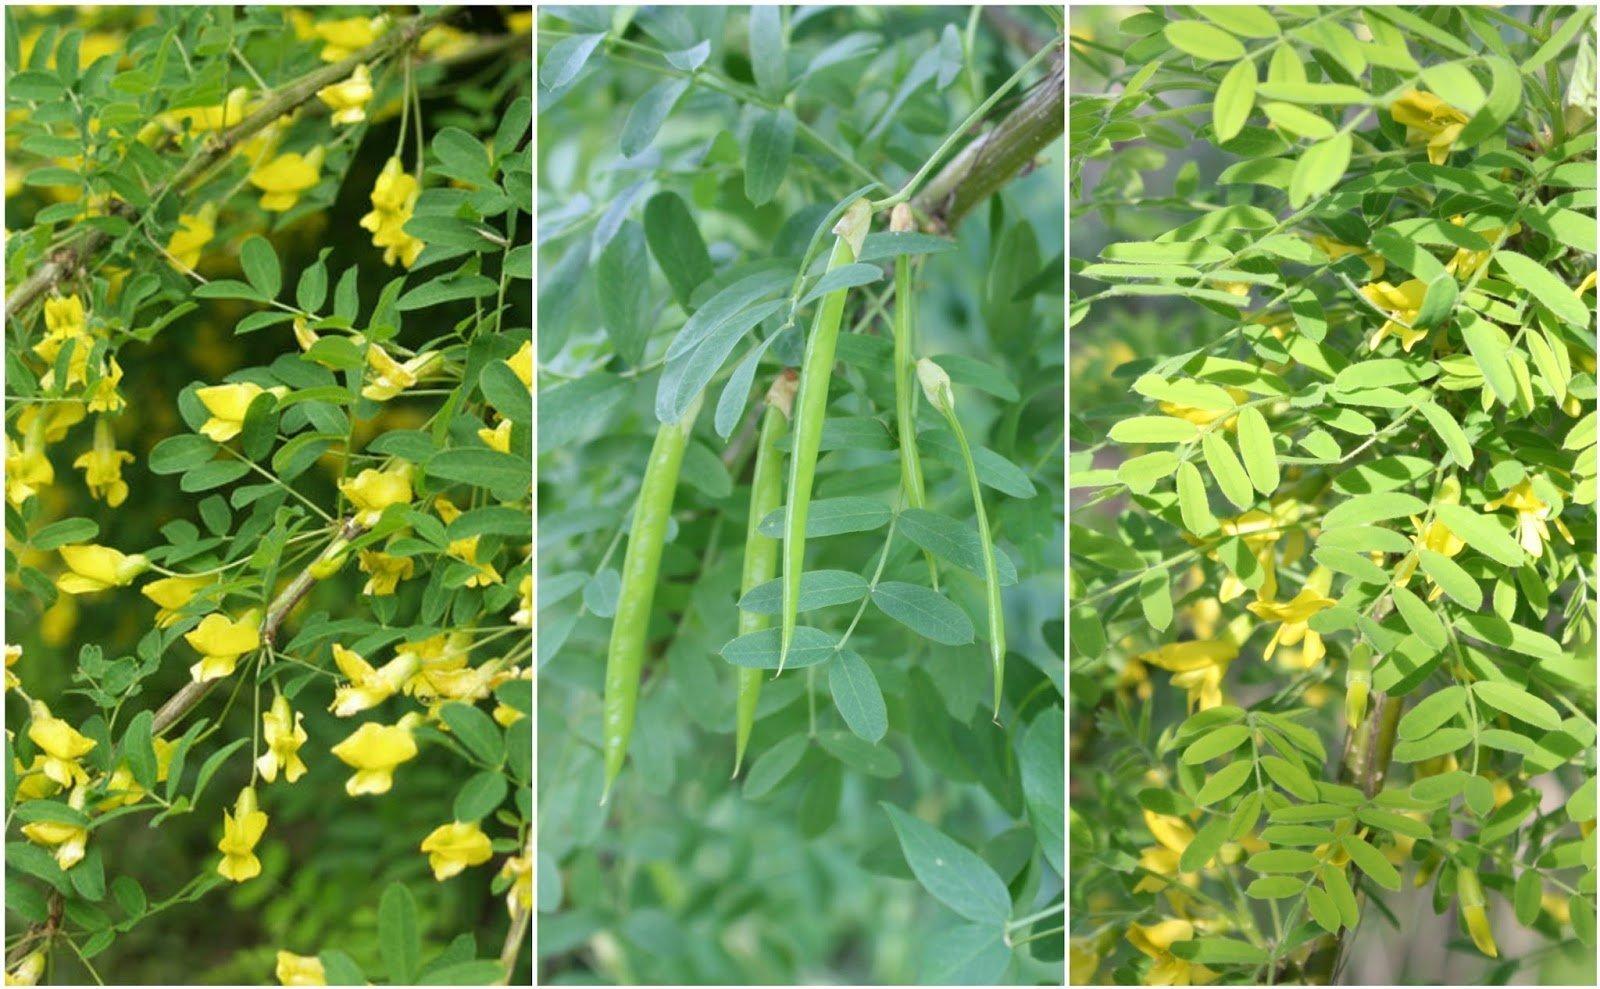 Permaculture Plant - Caragana arborescens.